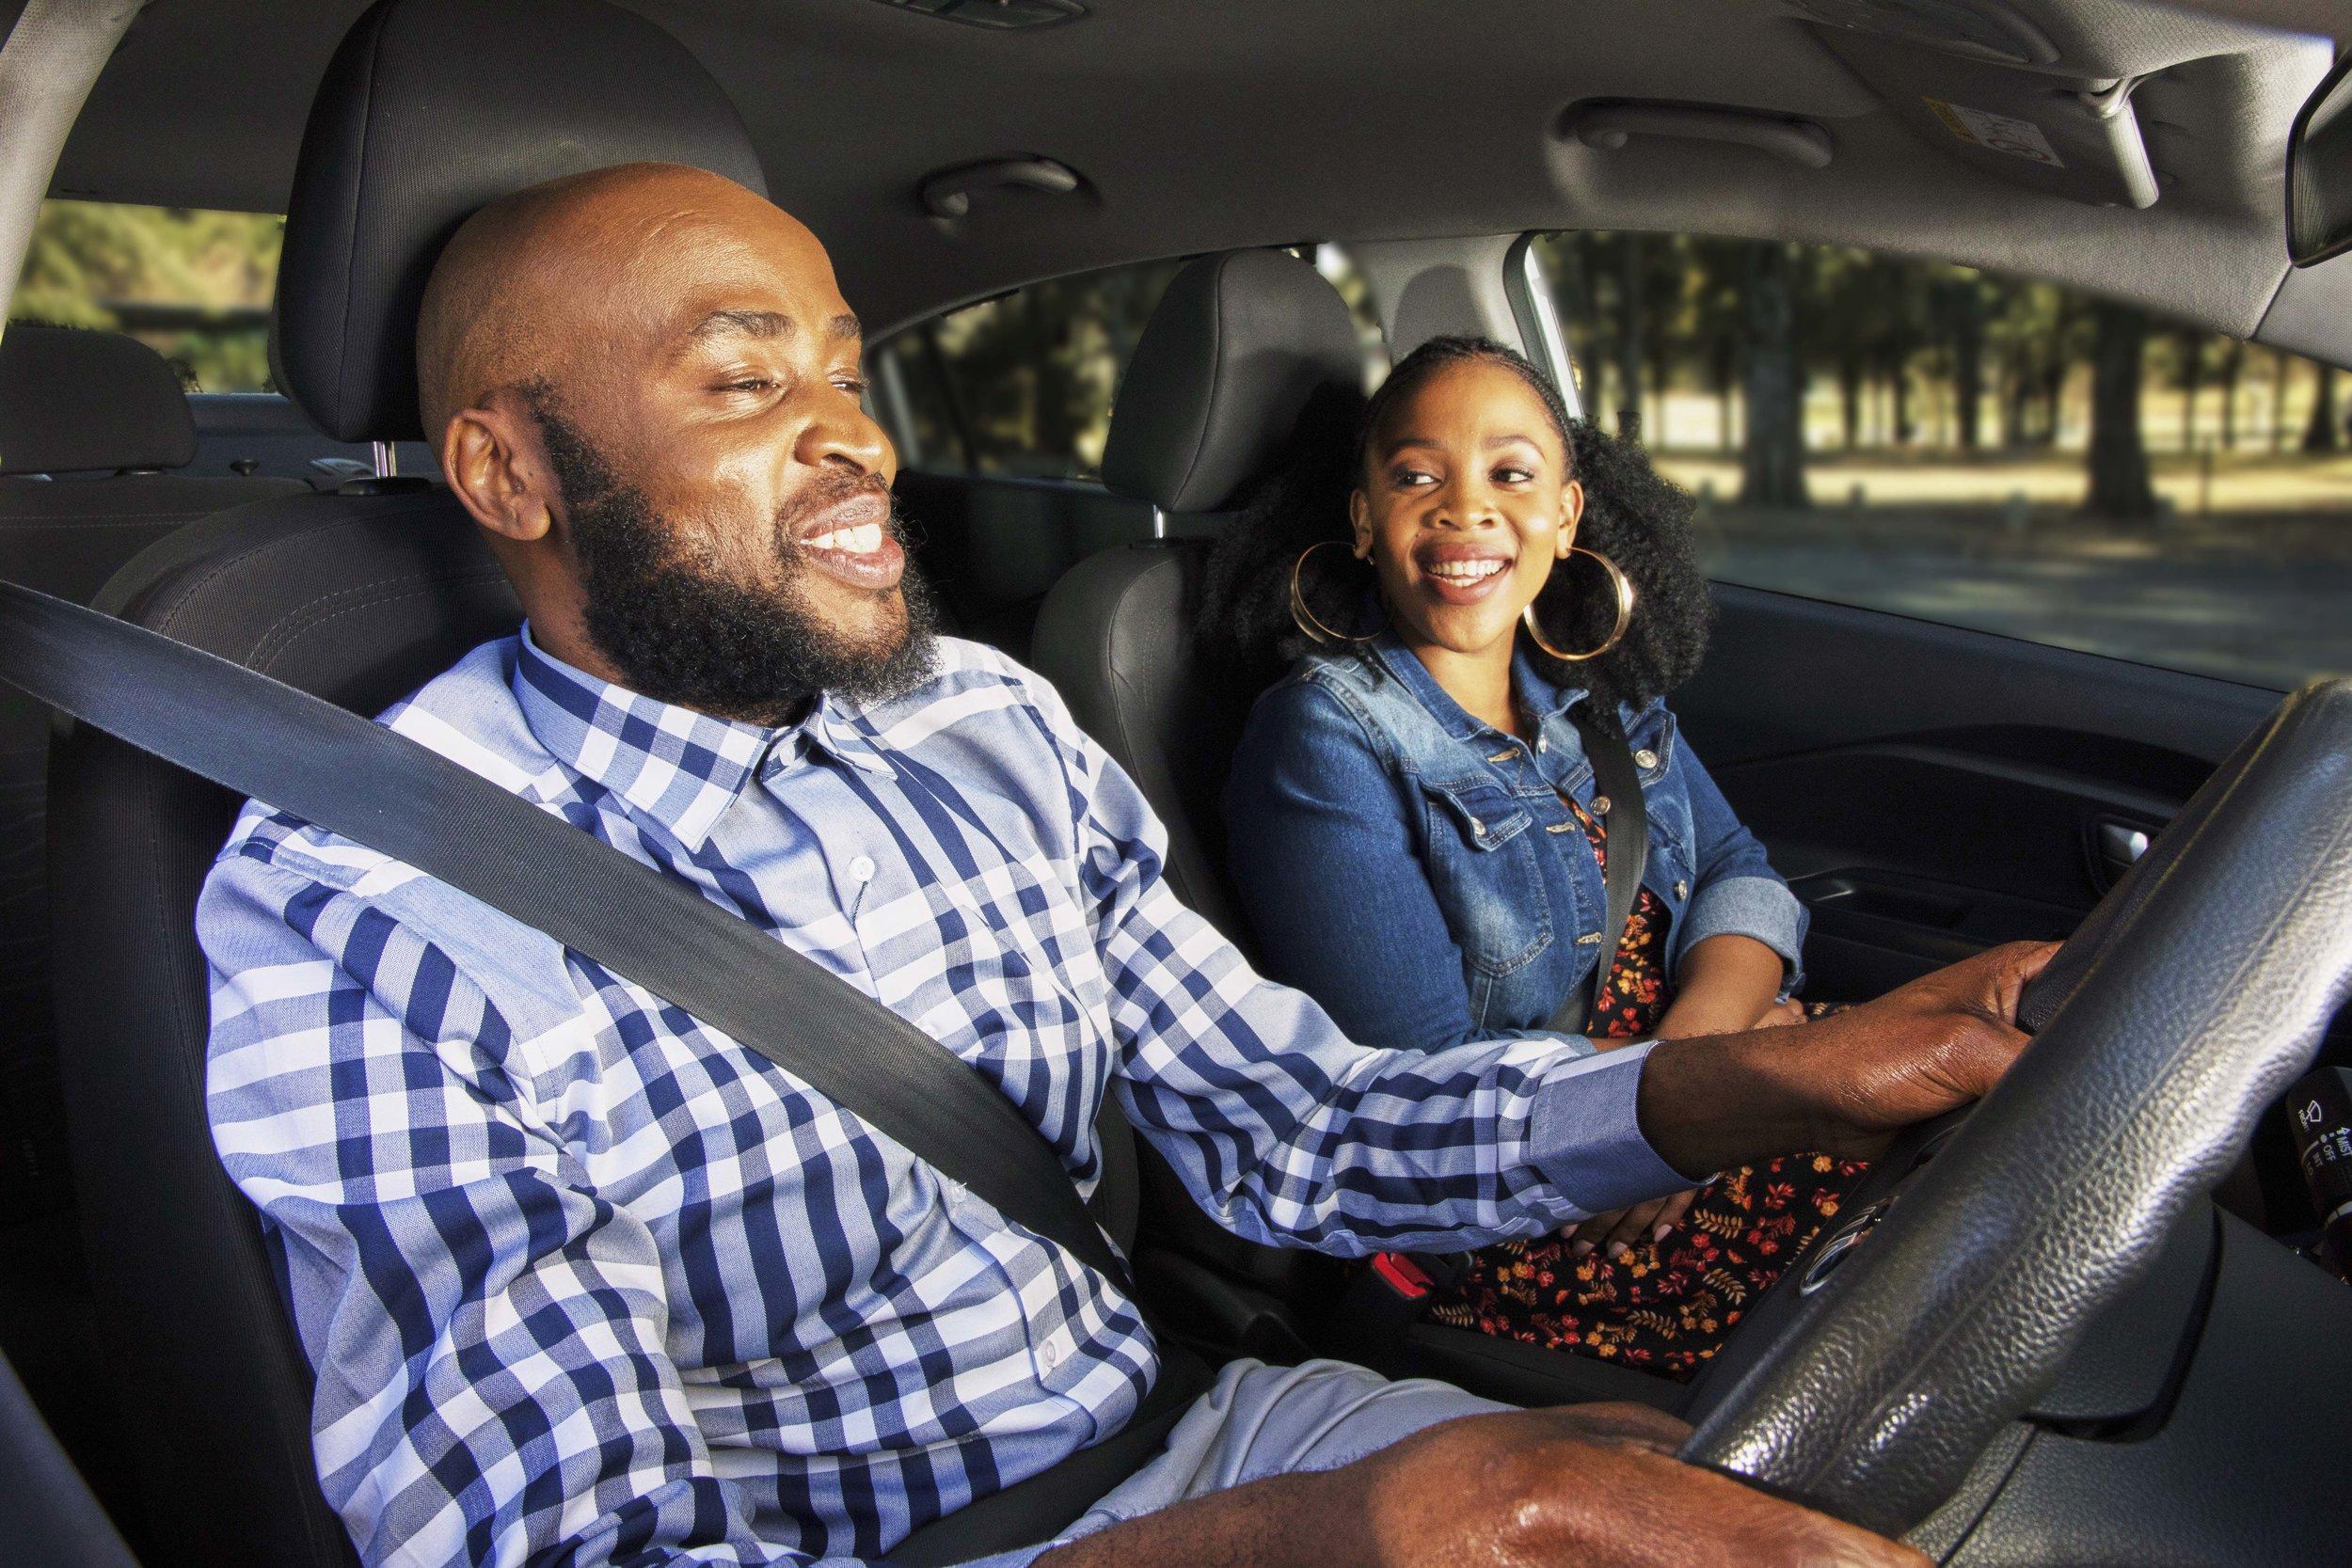 Uber shoot_South Africa Pair-102.jpg